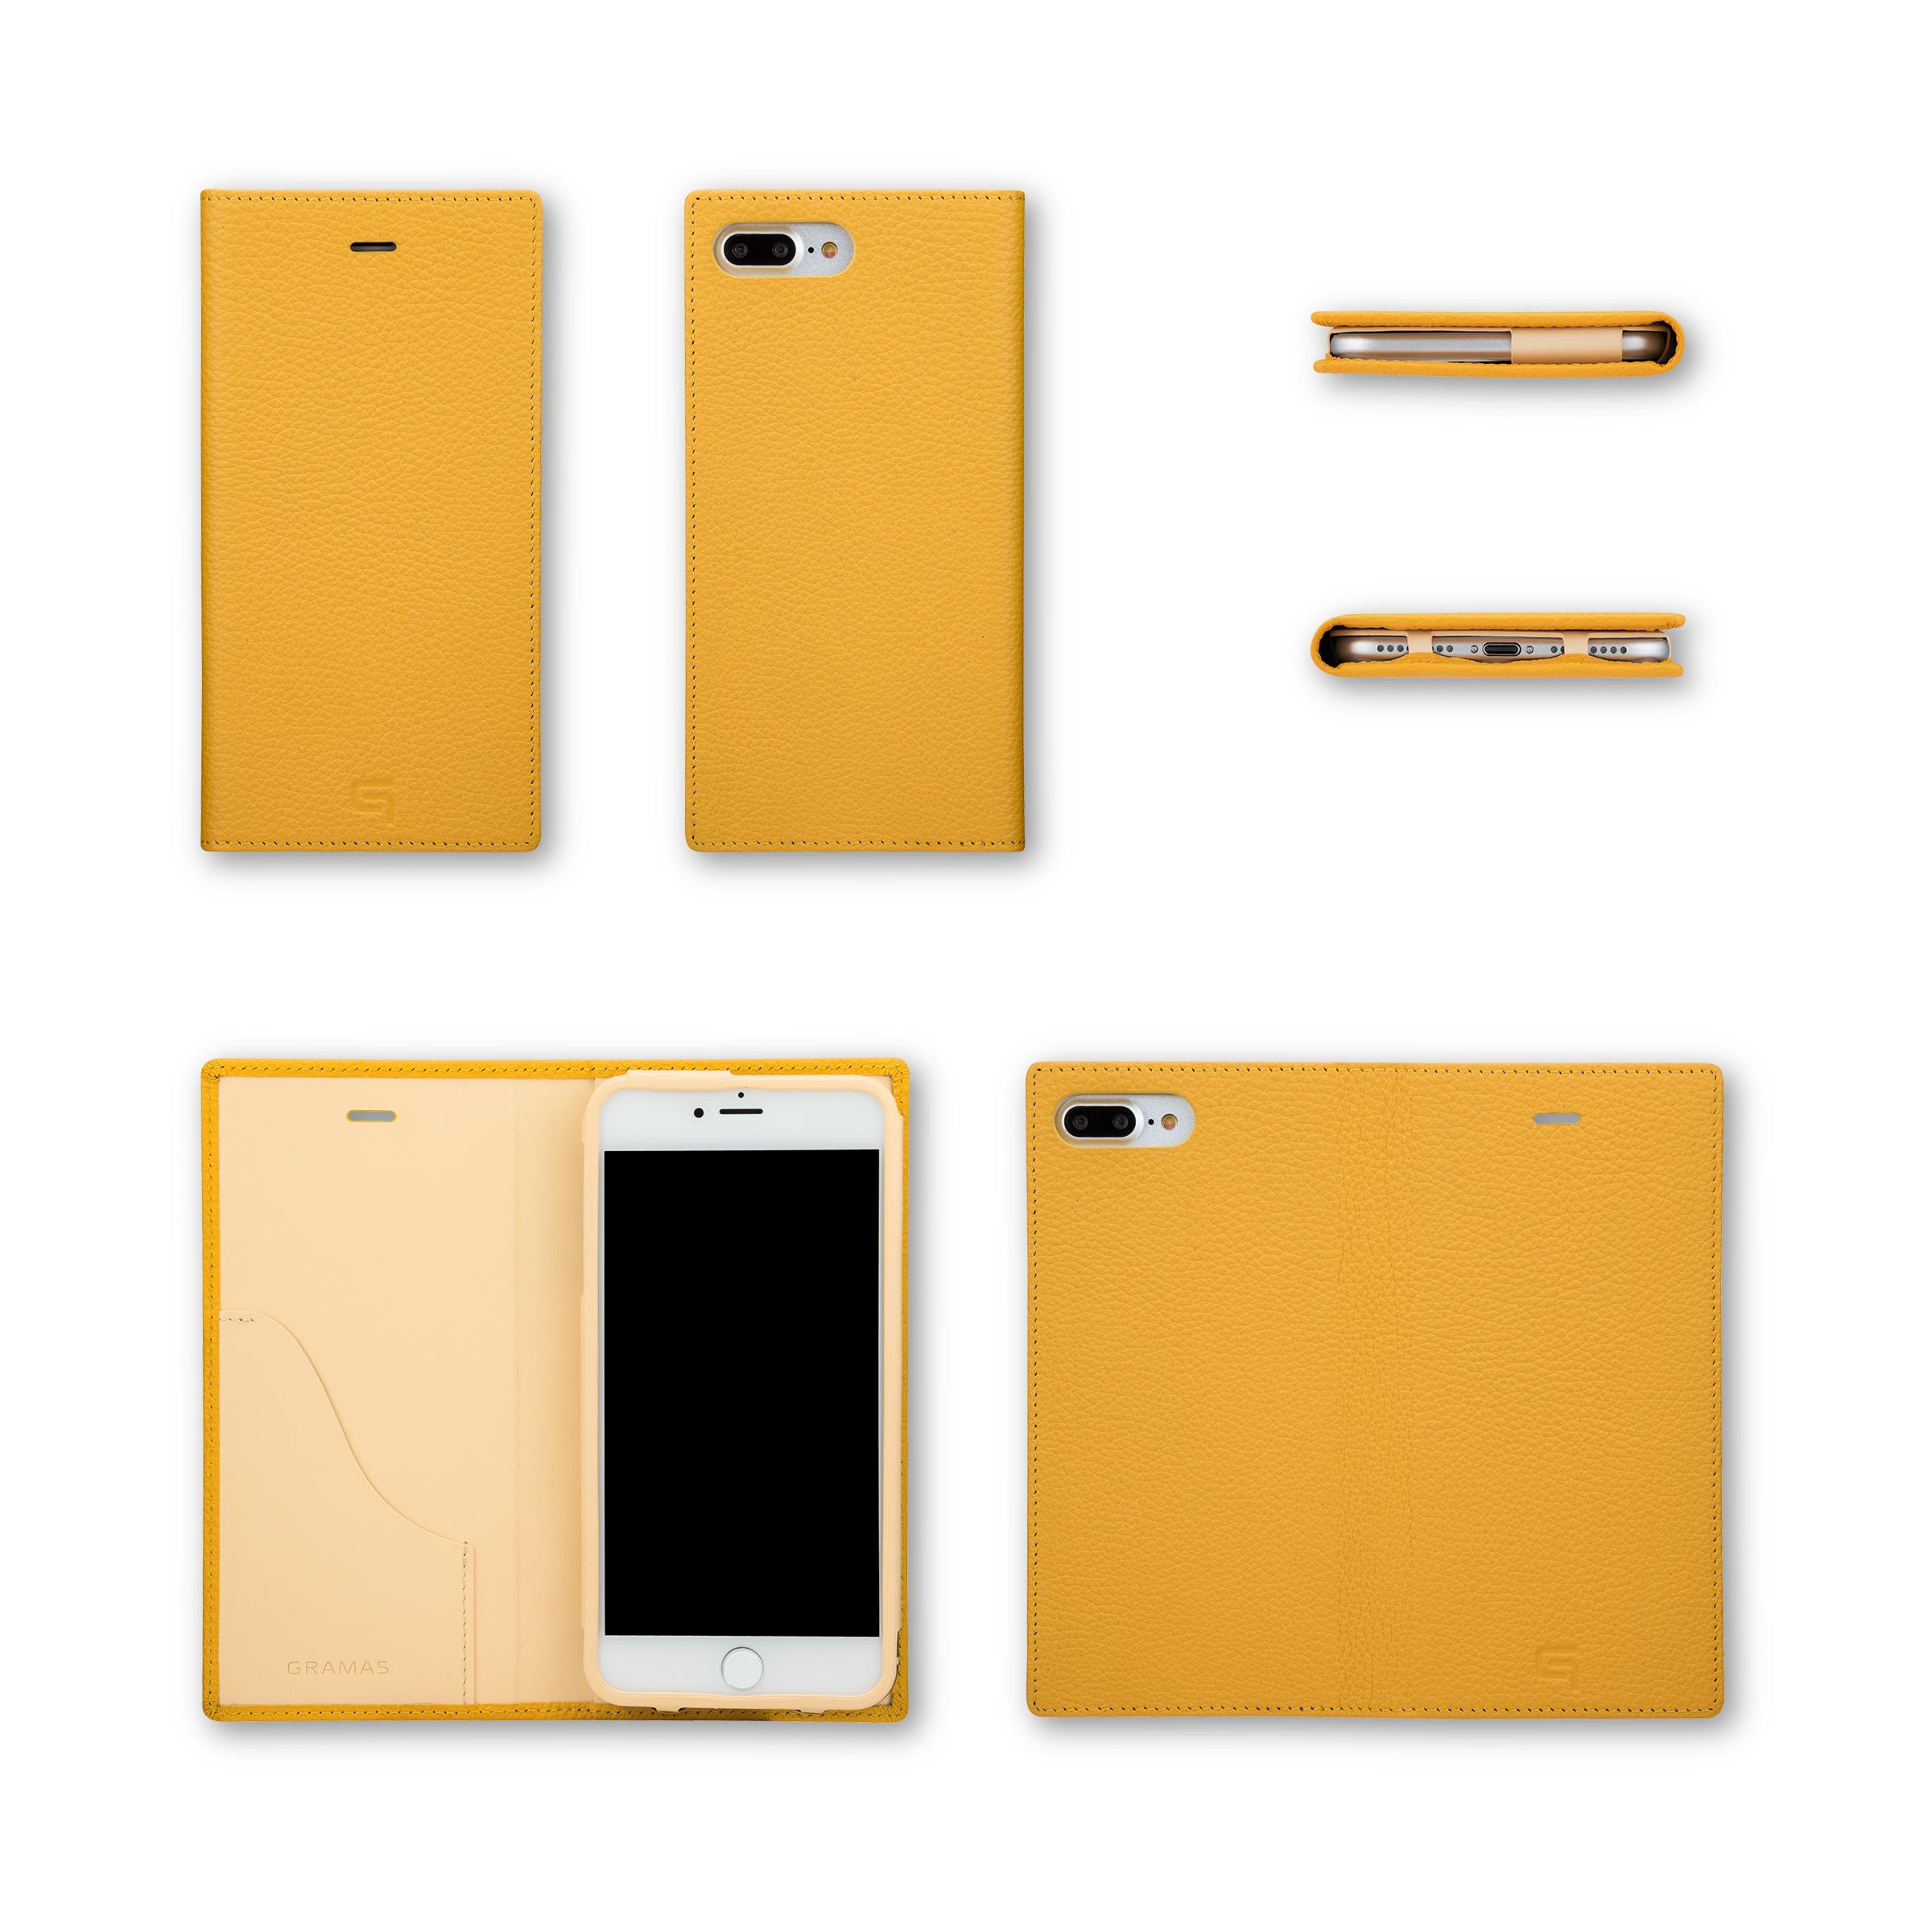 GRAMAS Shrunken-calf Full Leather Case for iPhone 7 Plus(Taupe(トープ)) シュランケンカーフ 手帳型フルレザーケース - 画像5